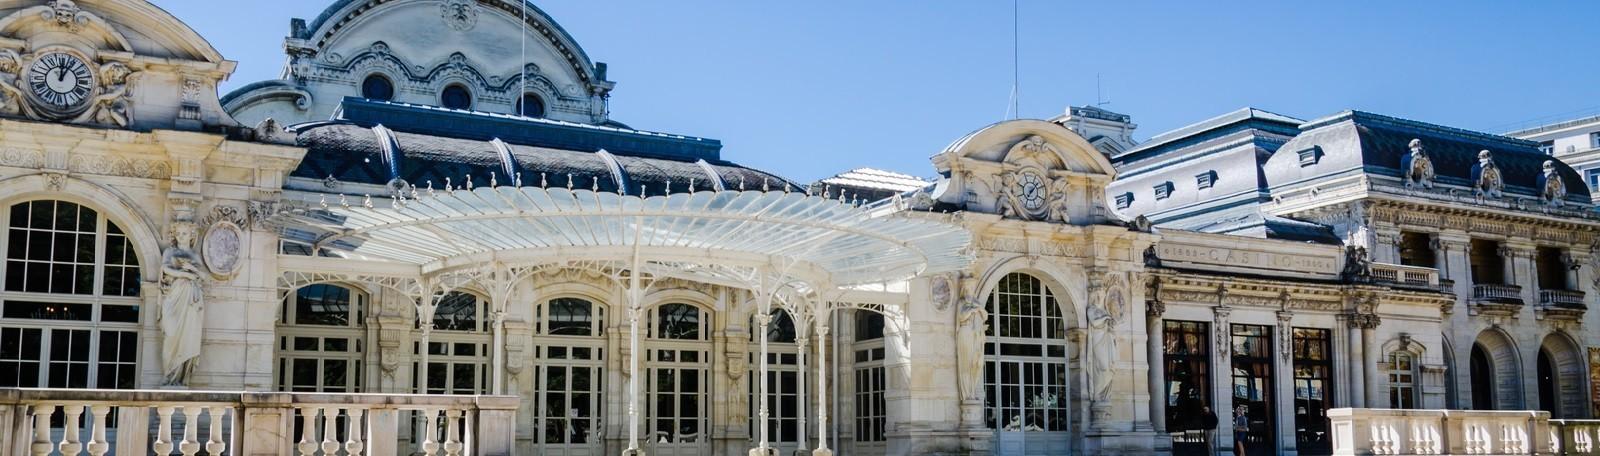 Car park Les 4 Chemins - Park in Vichy | Q-Park